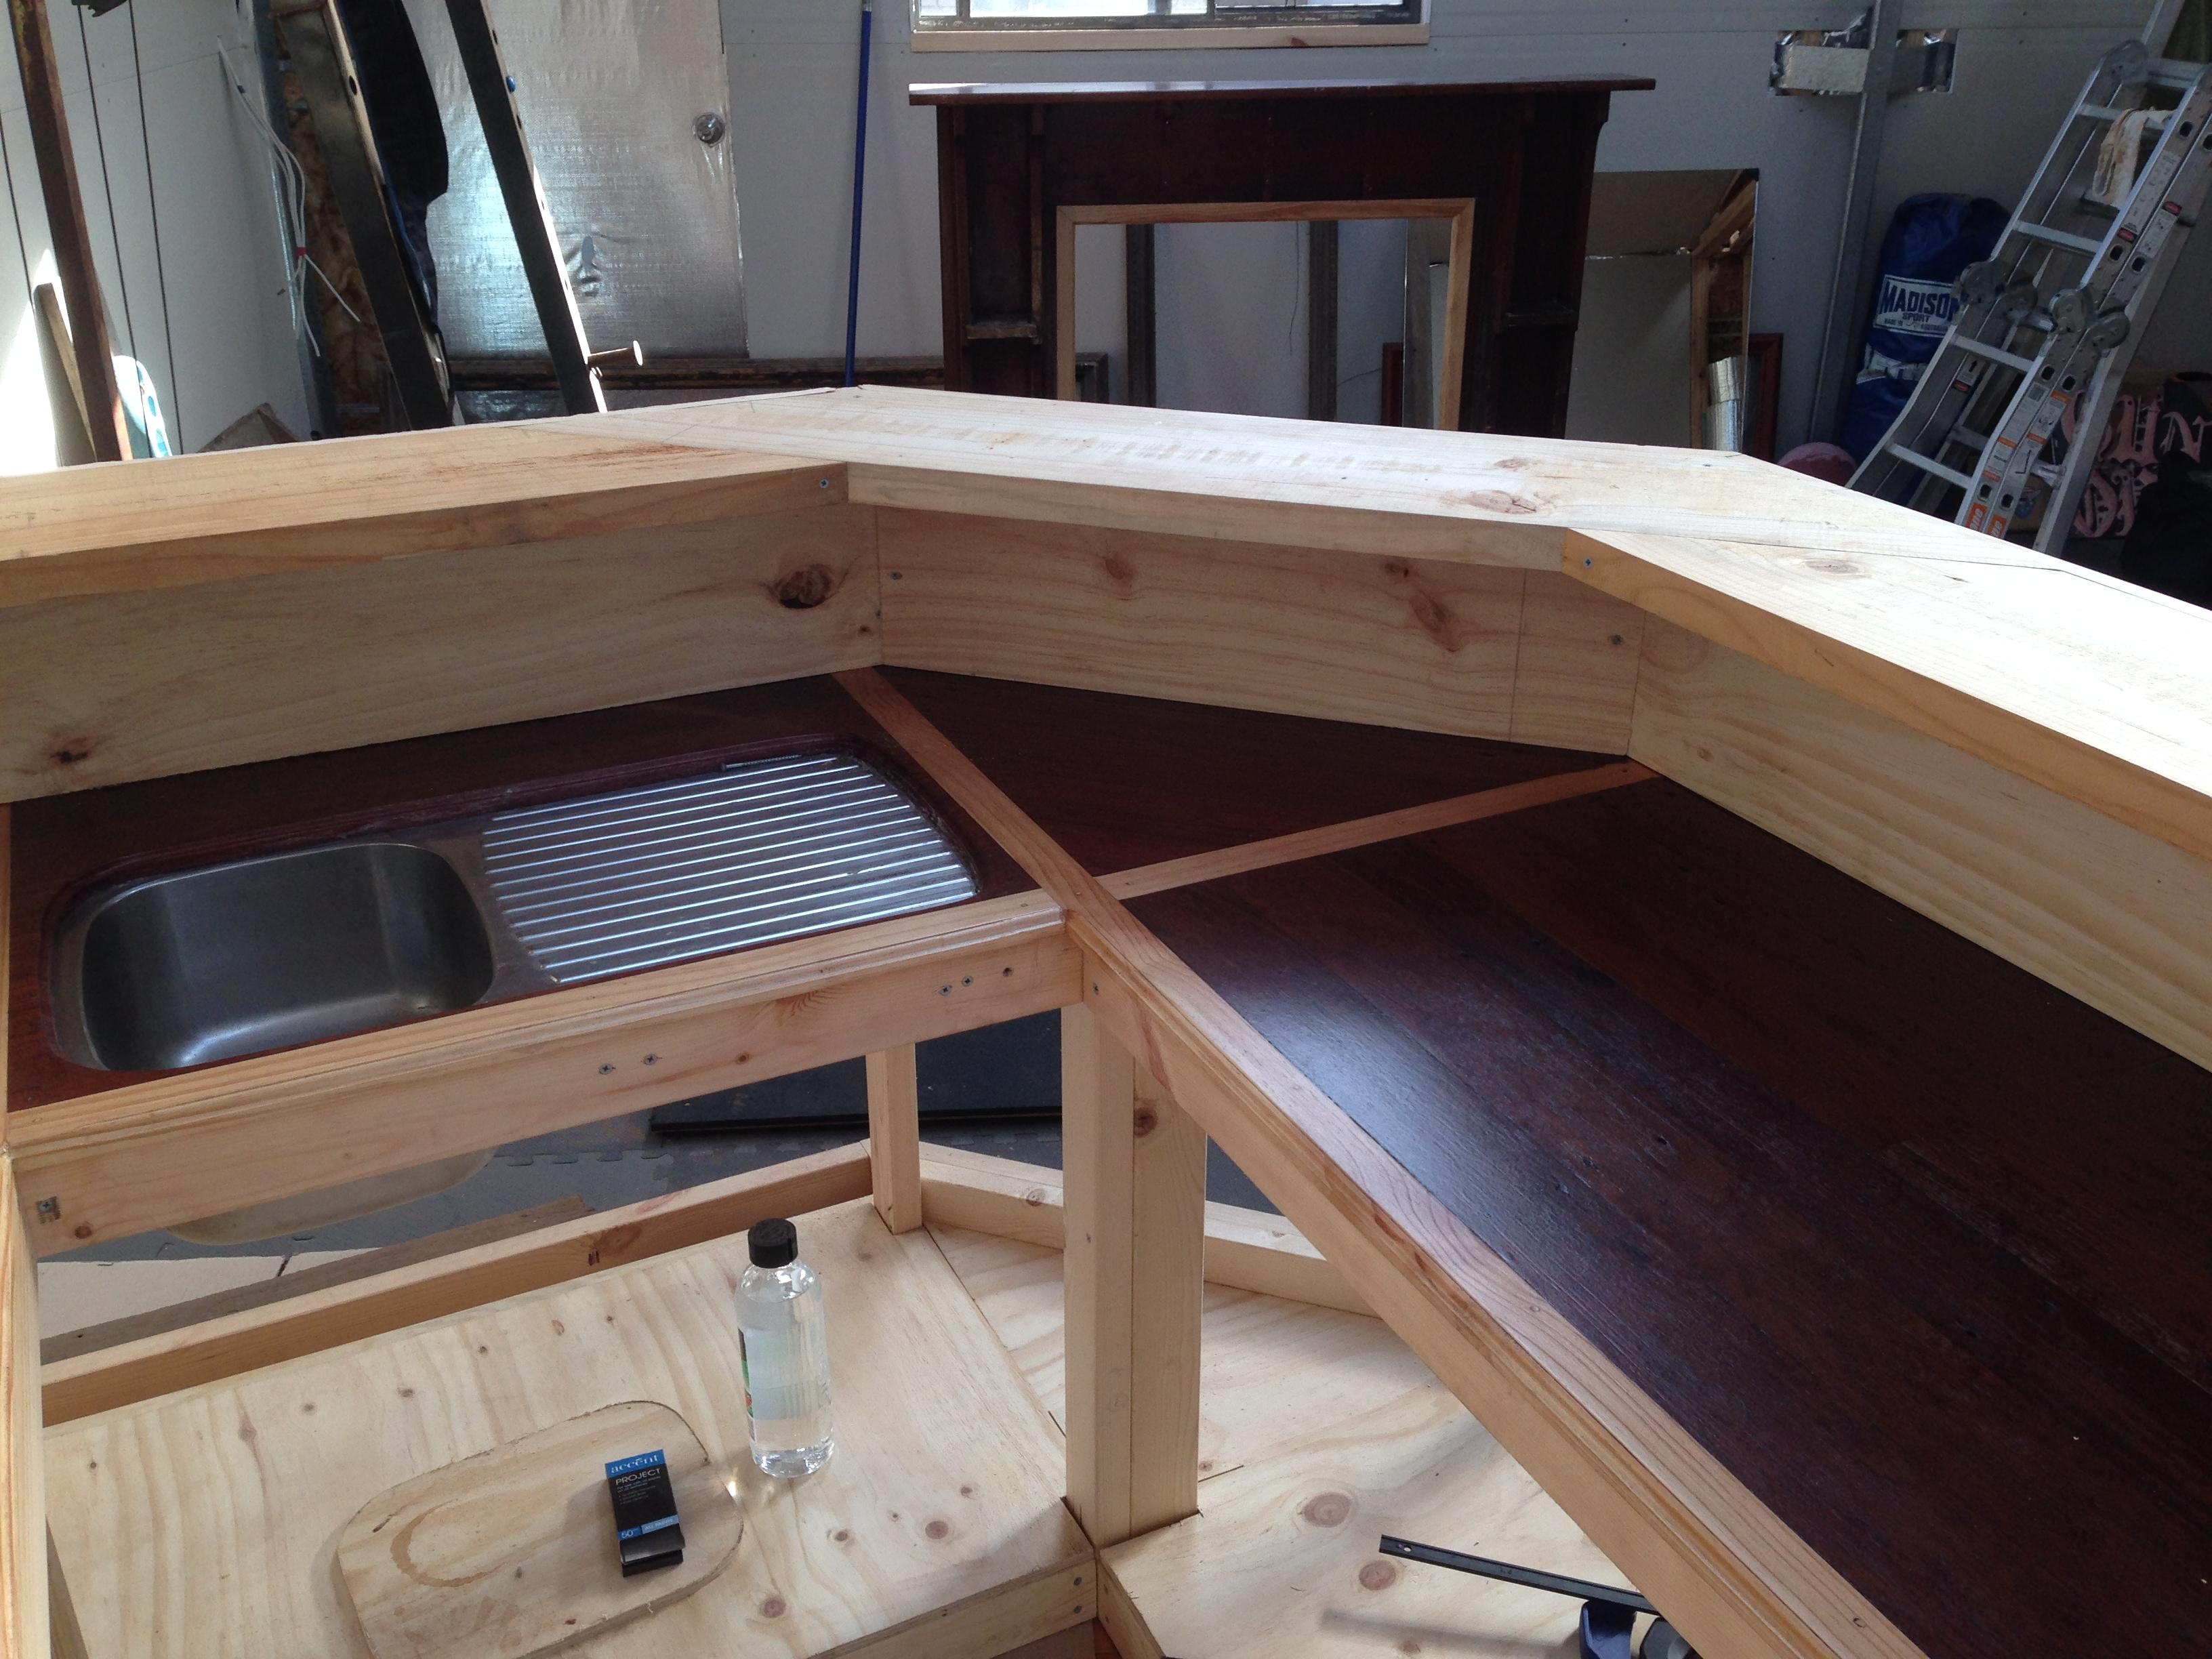 ,diy wood playset plans,bay window bench seat plans - Videos Download